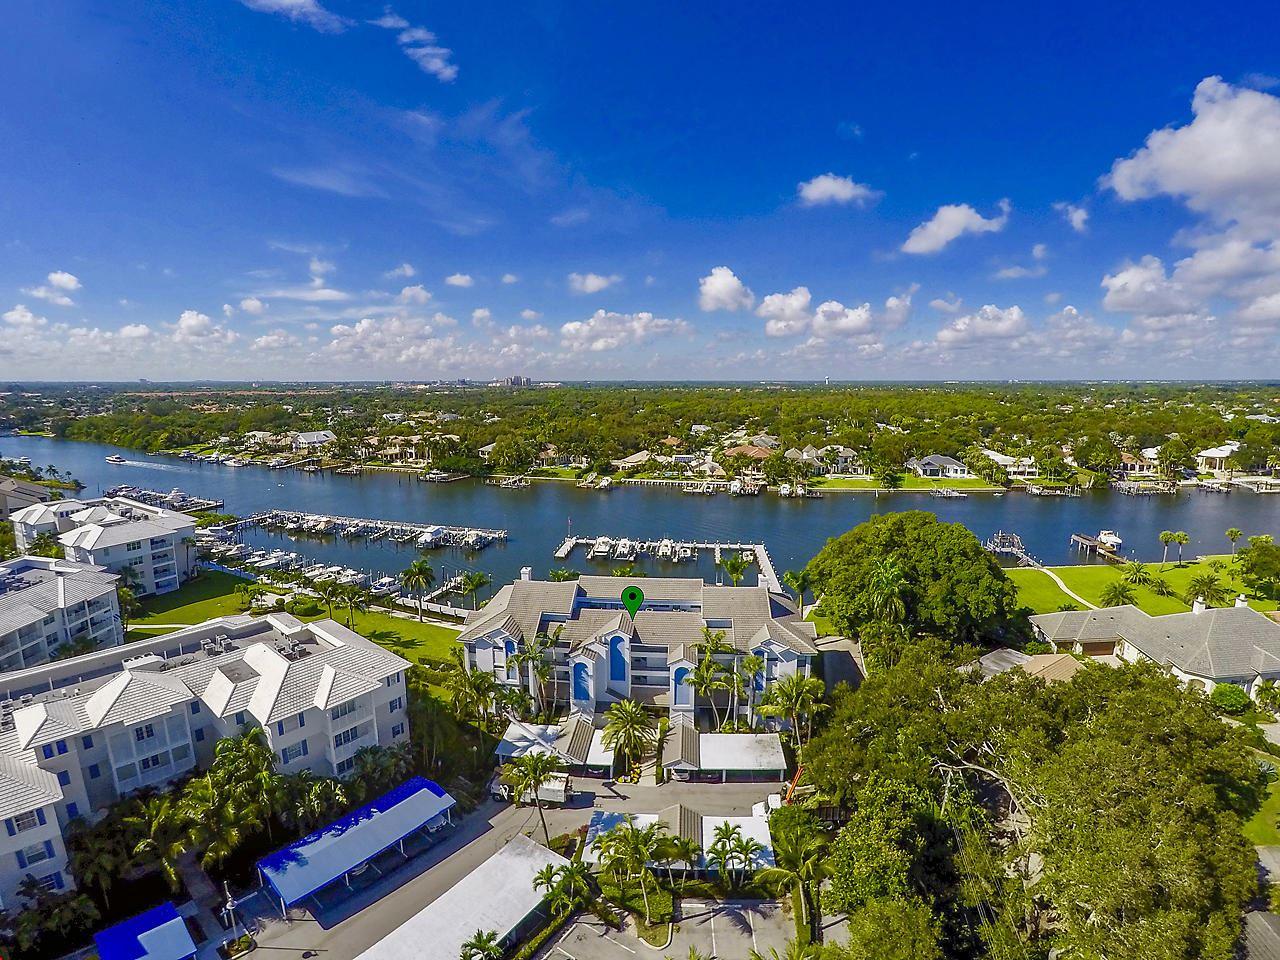 524 Bay Colony With 40\' Slip Drive N, North Palm Beach, FL 33408 - #: RX-10623518